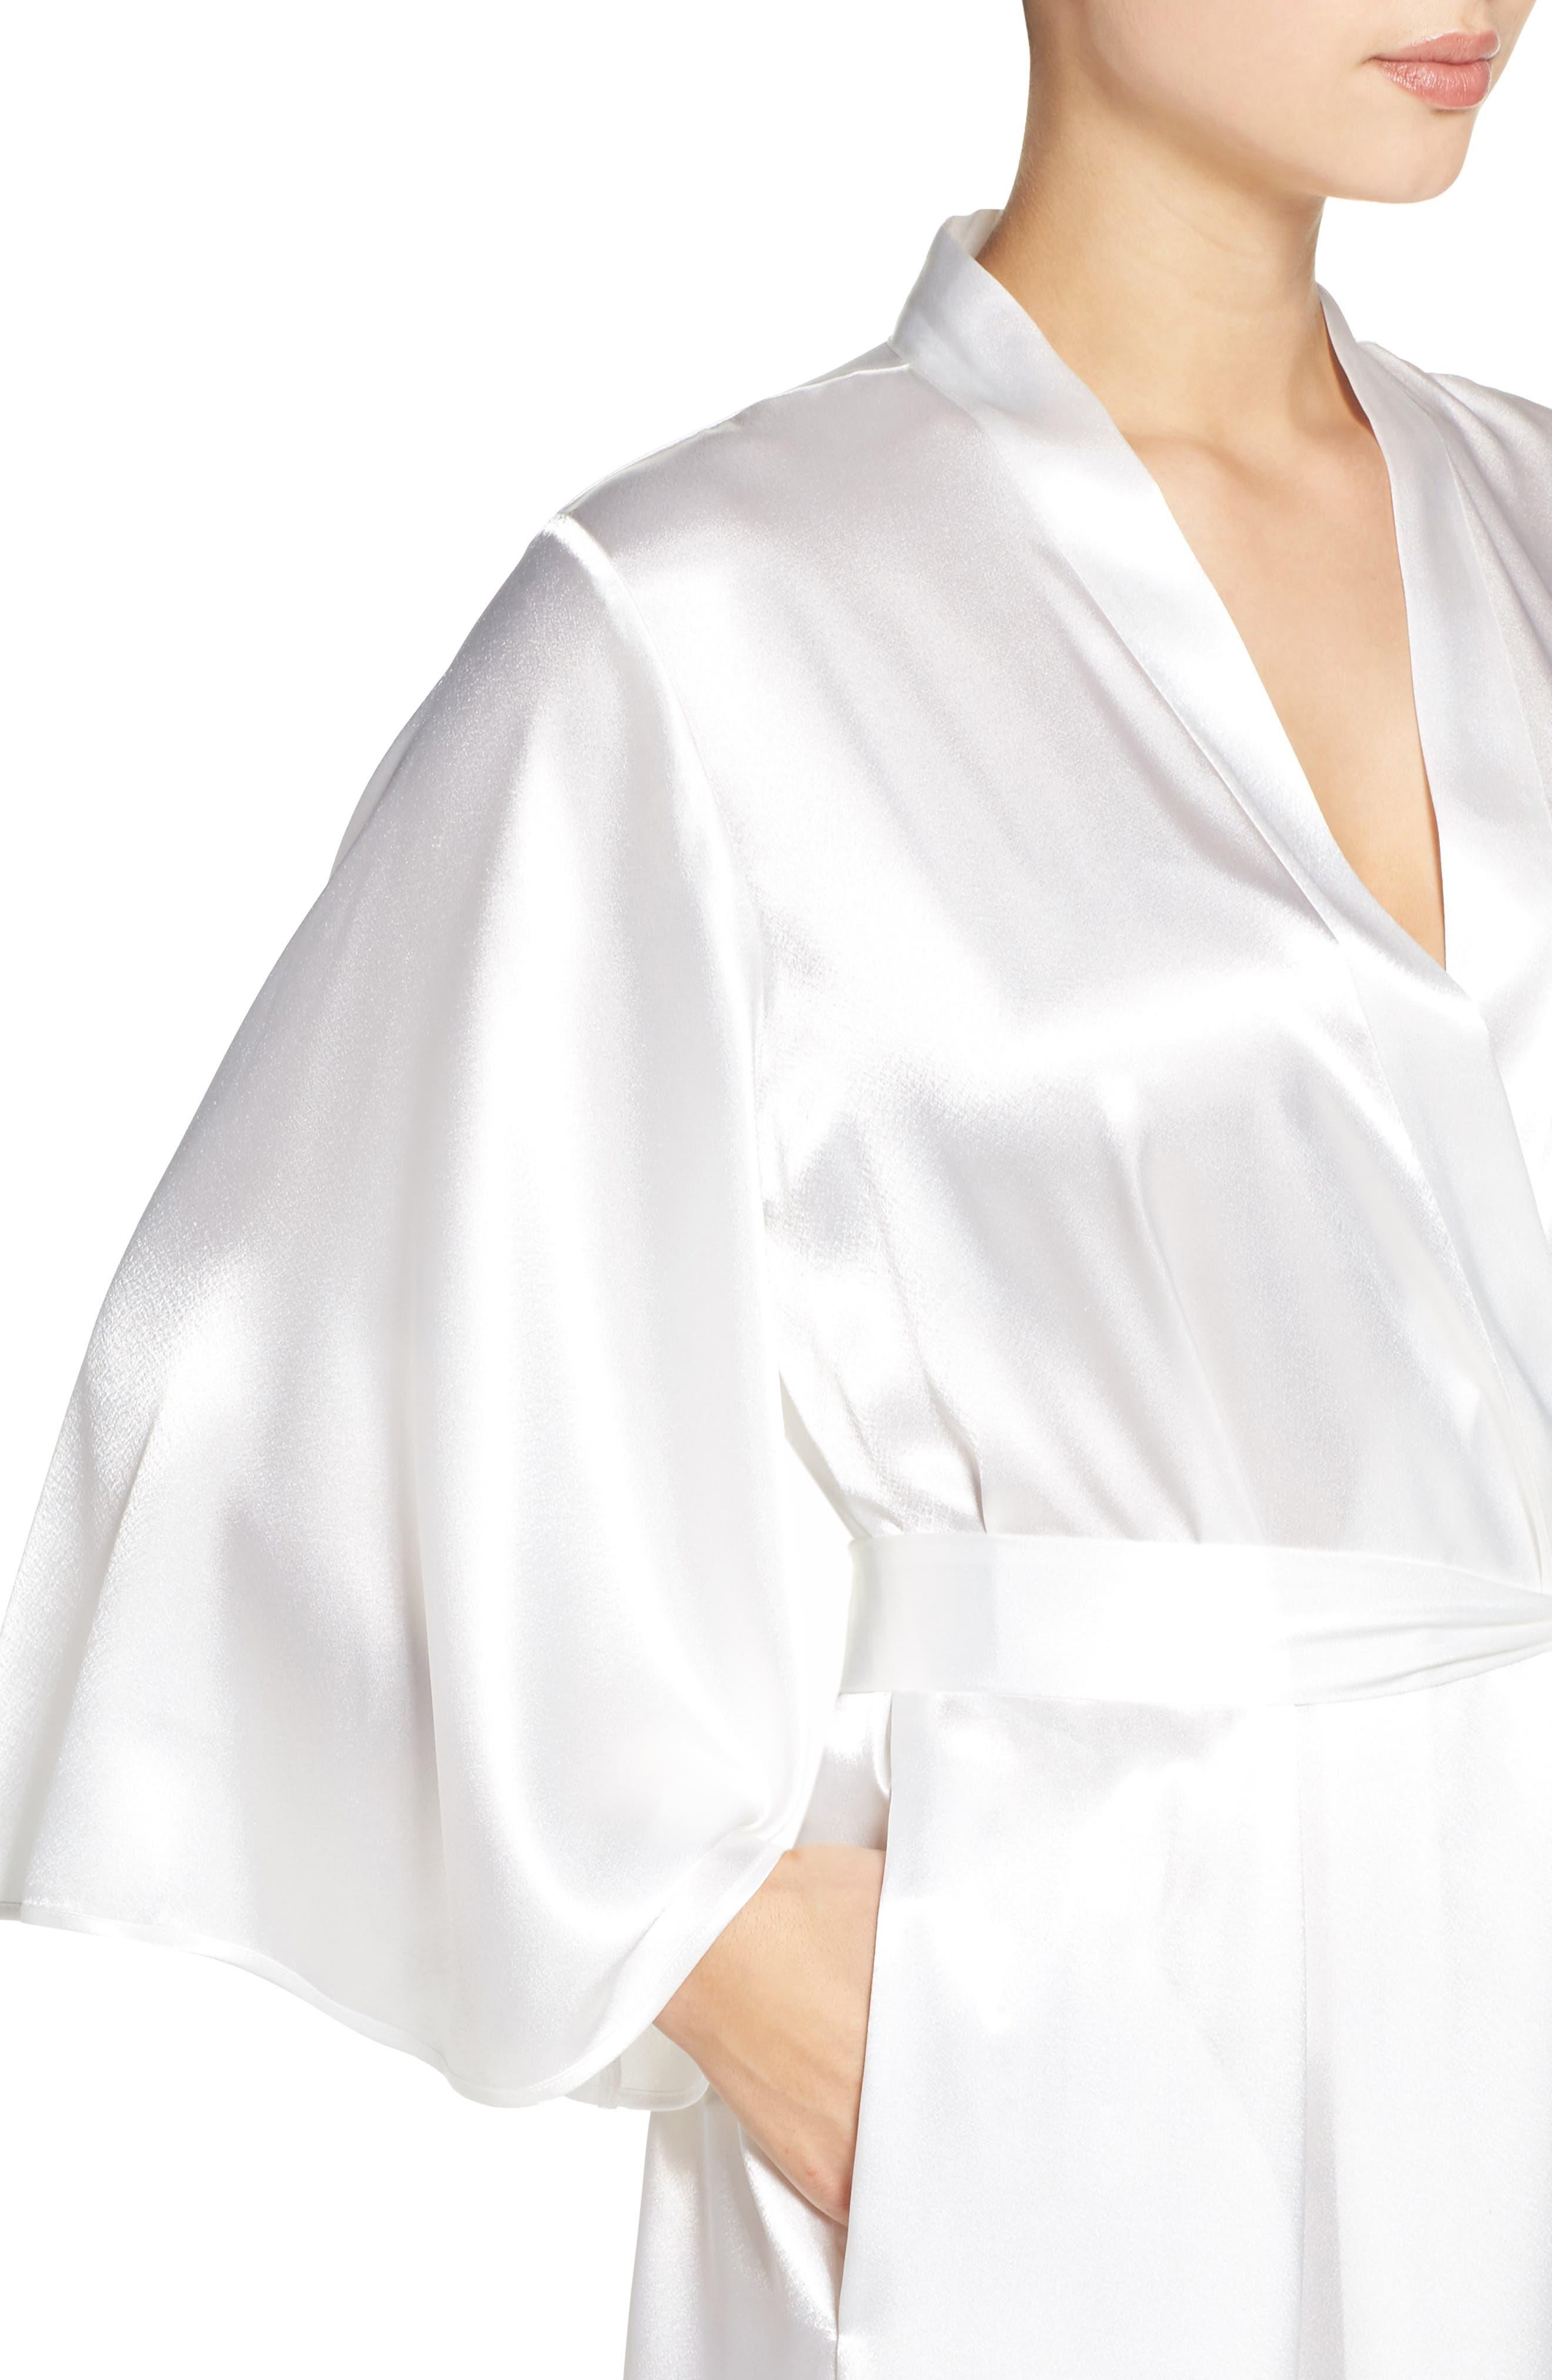 Sleepwear Charmeuse Robe,                             Alternate thumbnail 4, color,                             178